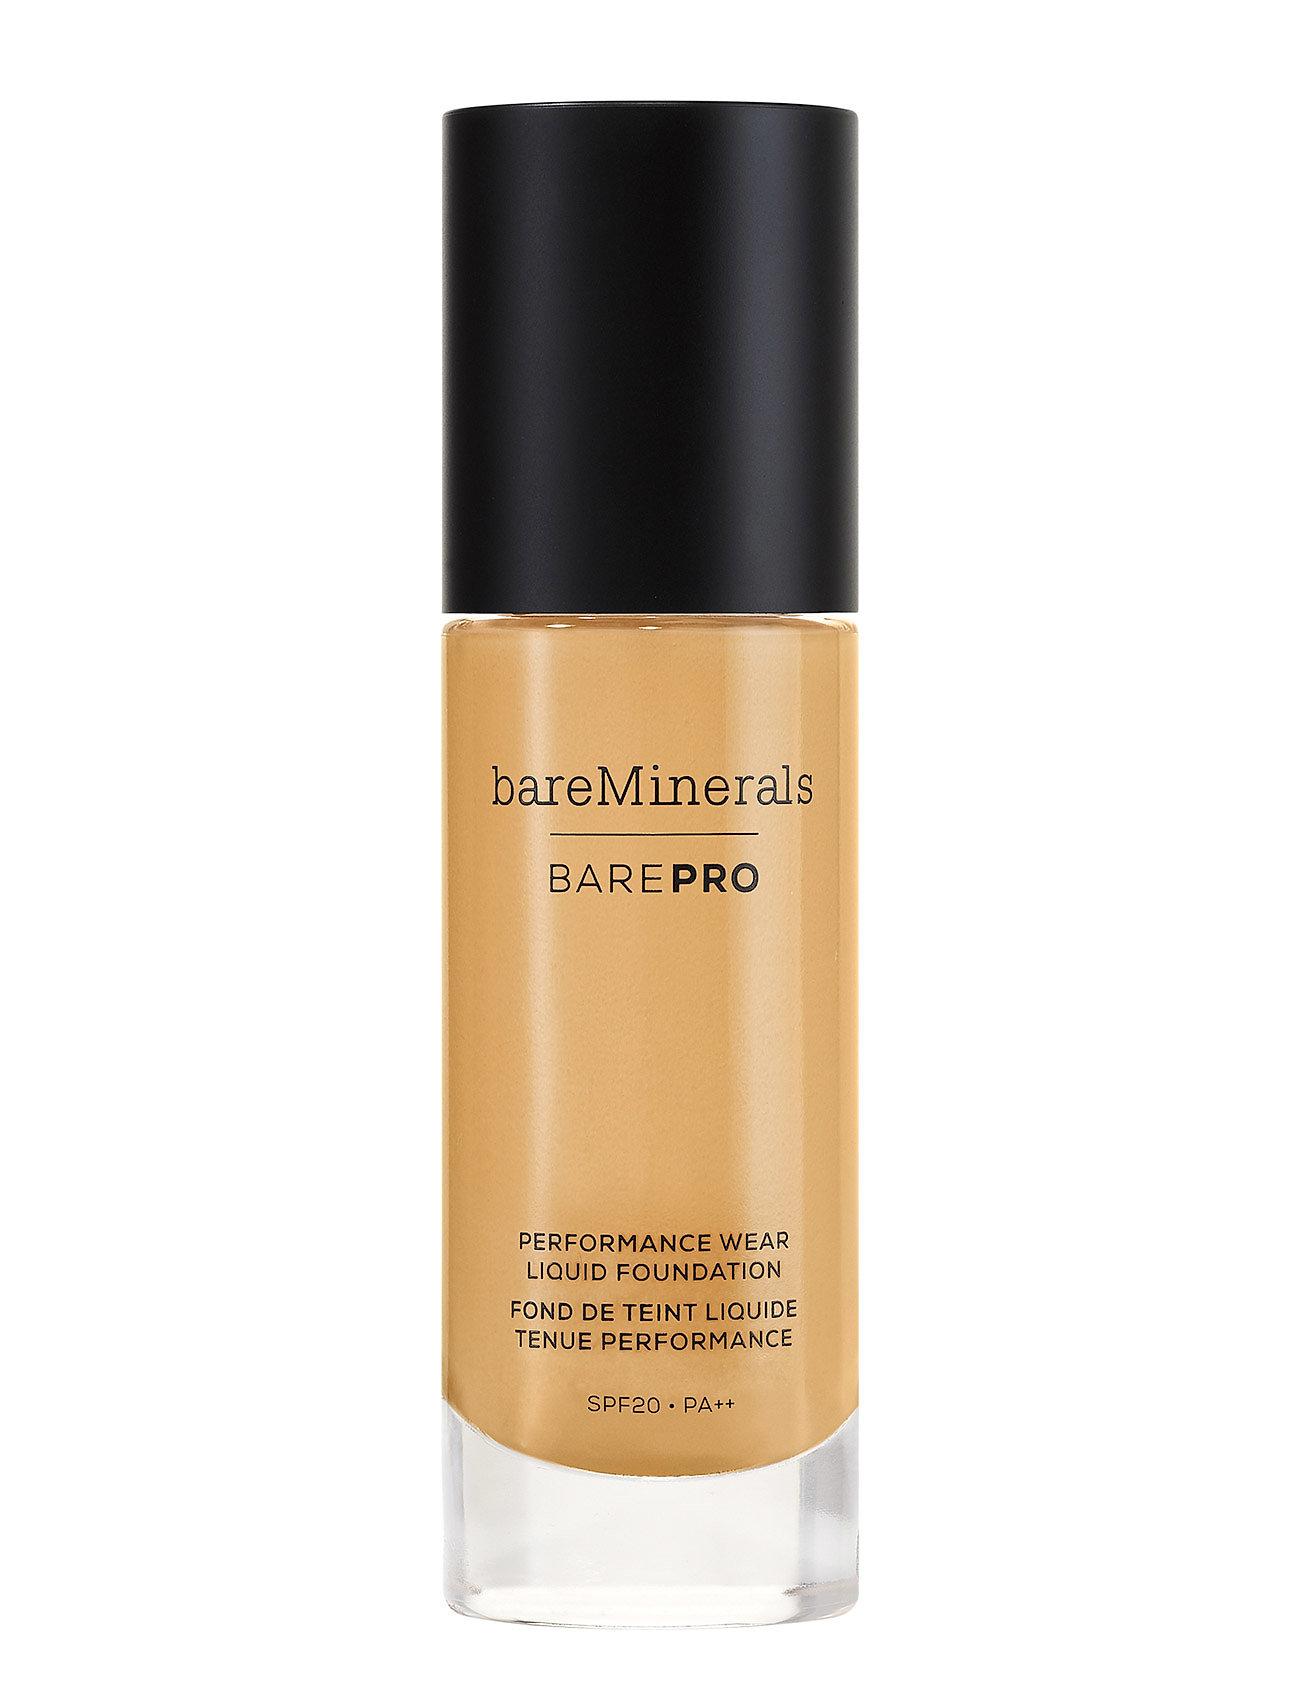 Image of Barepro Performance Wear Liquid Foundation Spf 20 Foundation Makeup BareMinerals (3067521679)